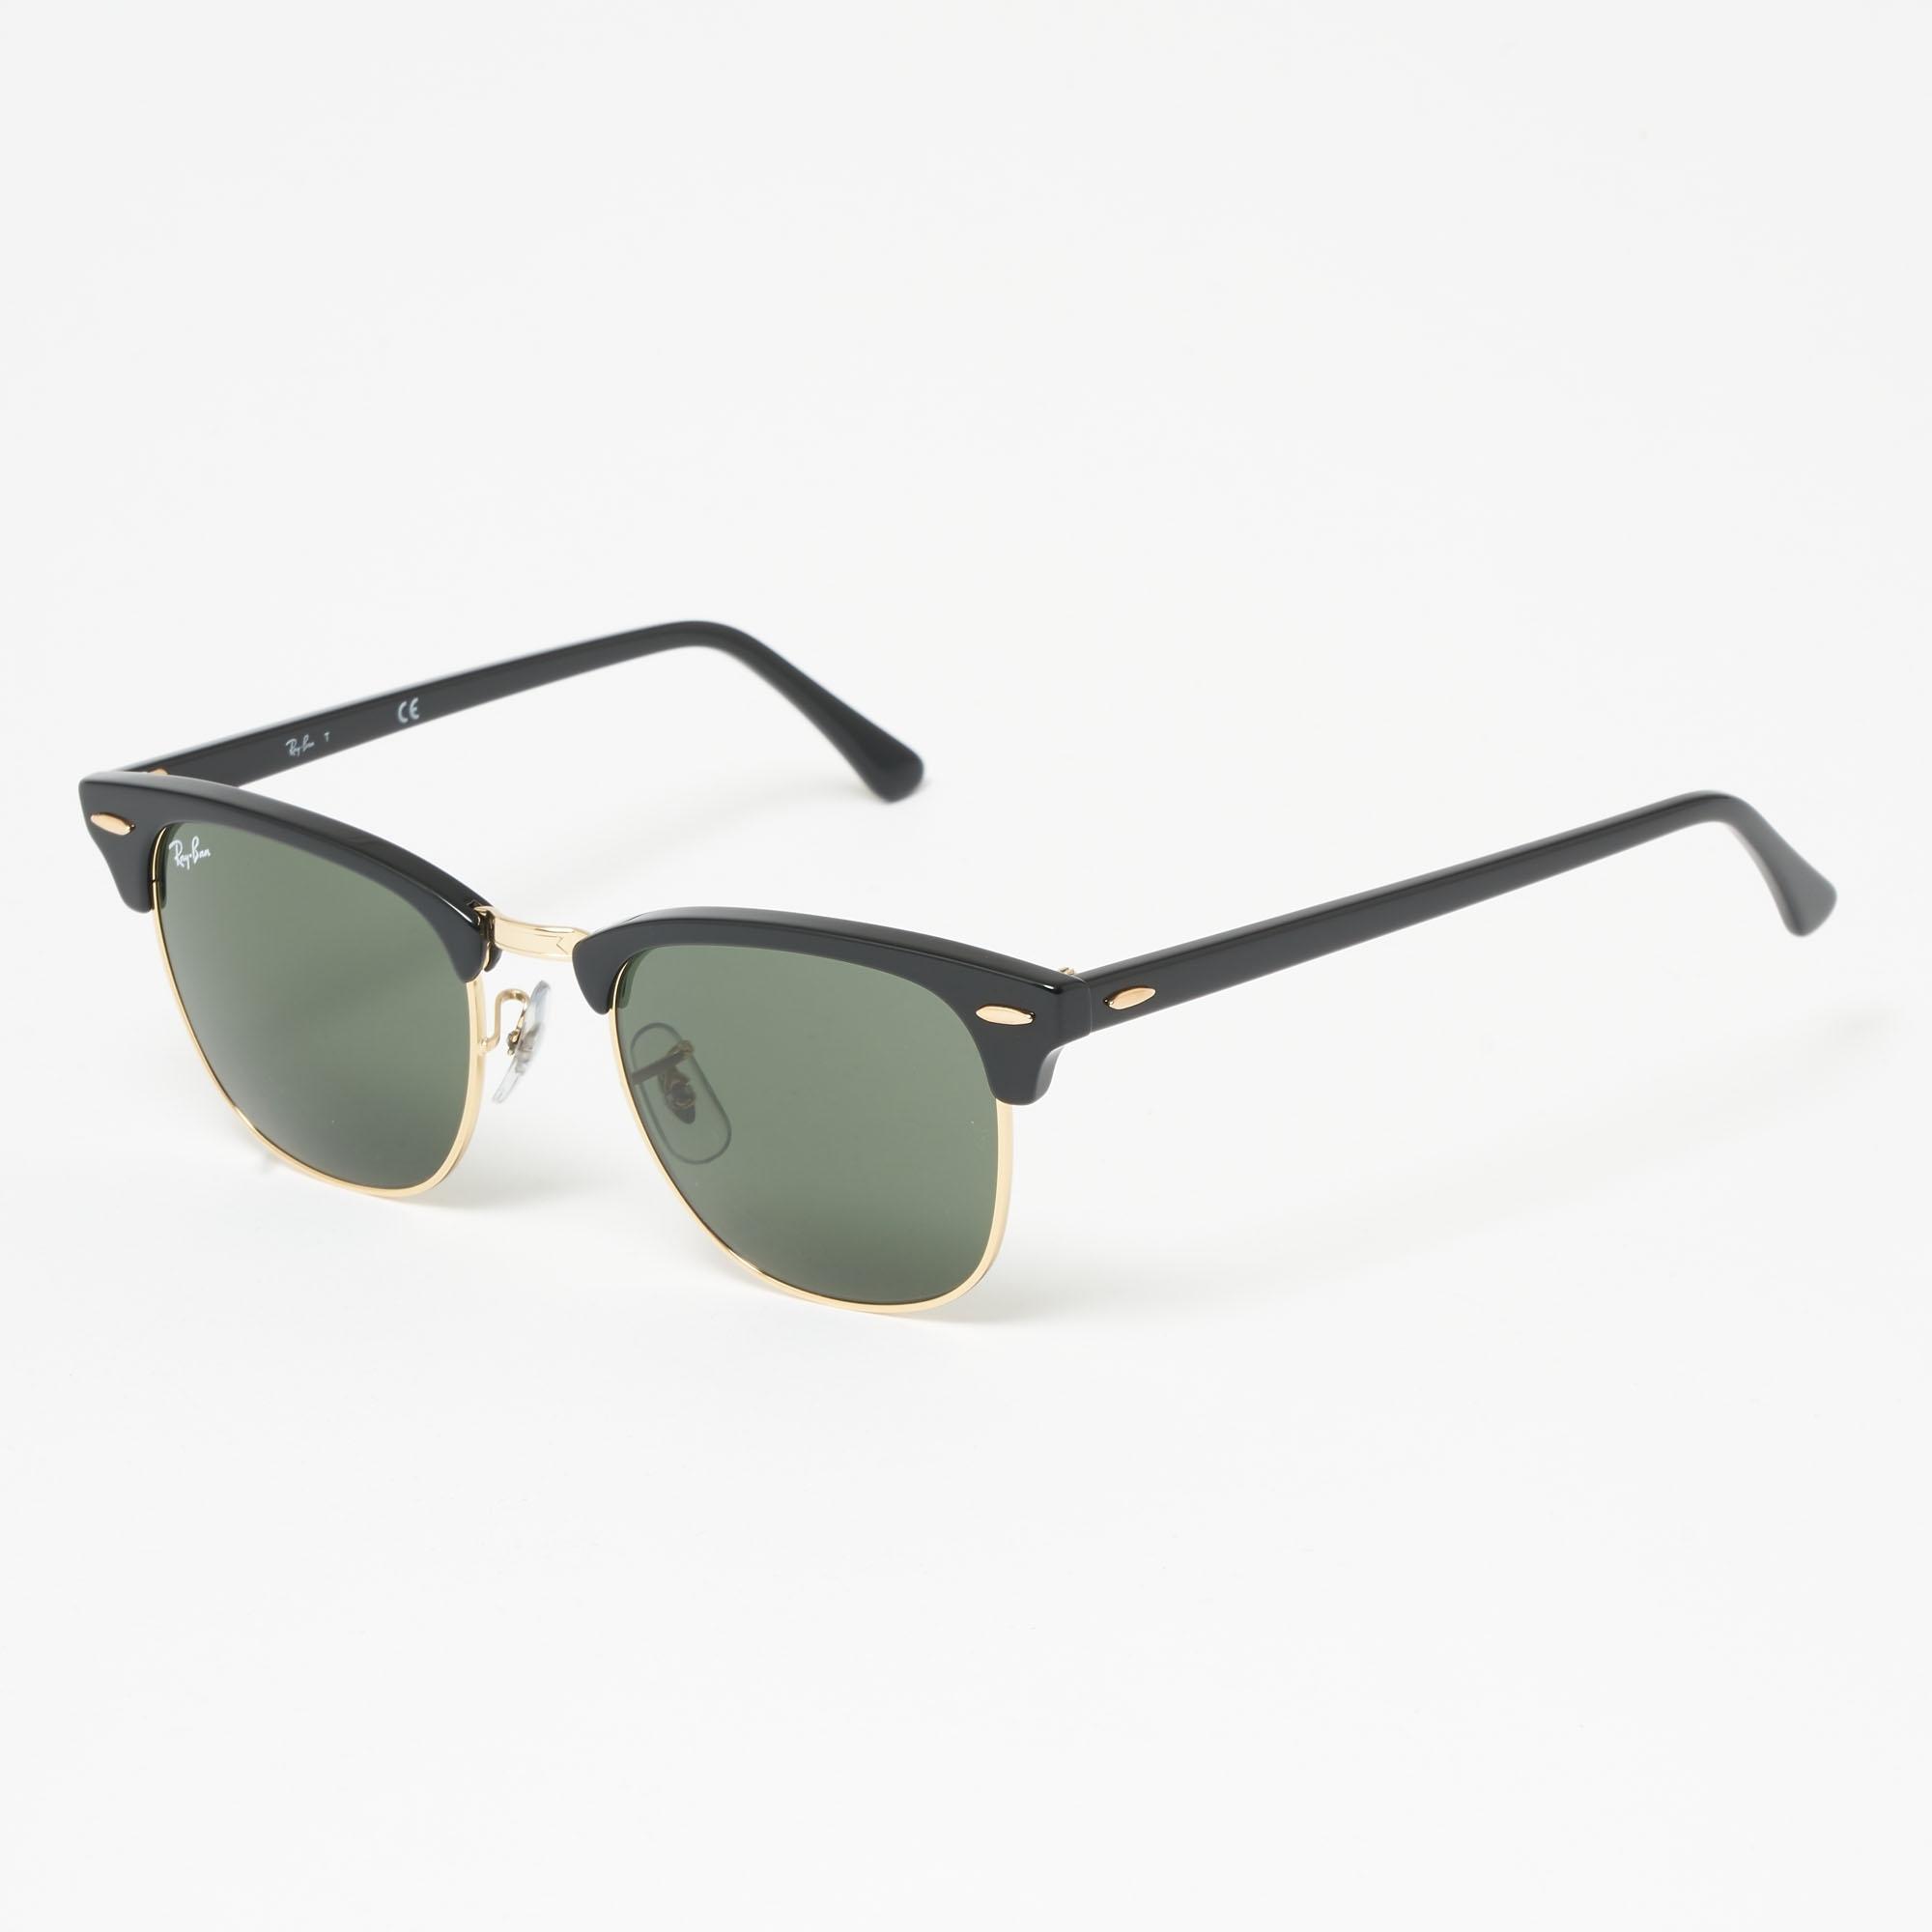 e1784bd23d Black Clubround Classic Sunglasses - Green Classic G-15 Lenses